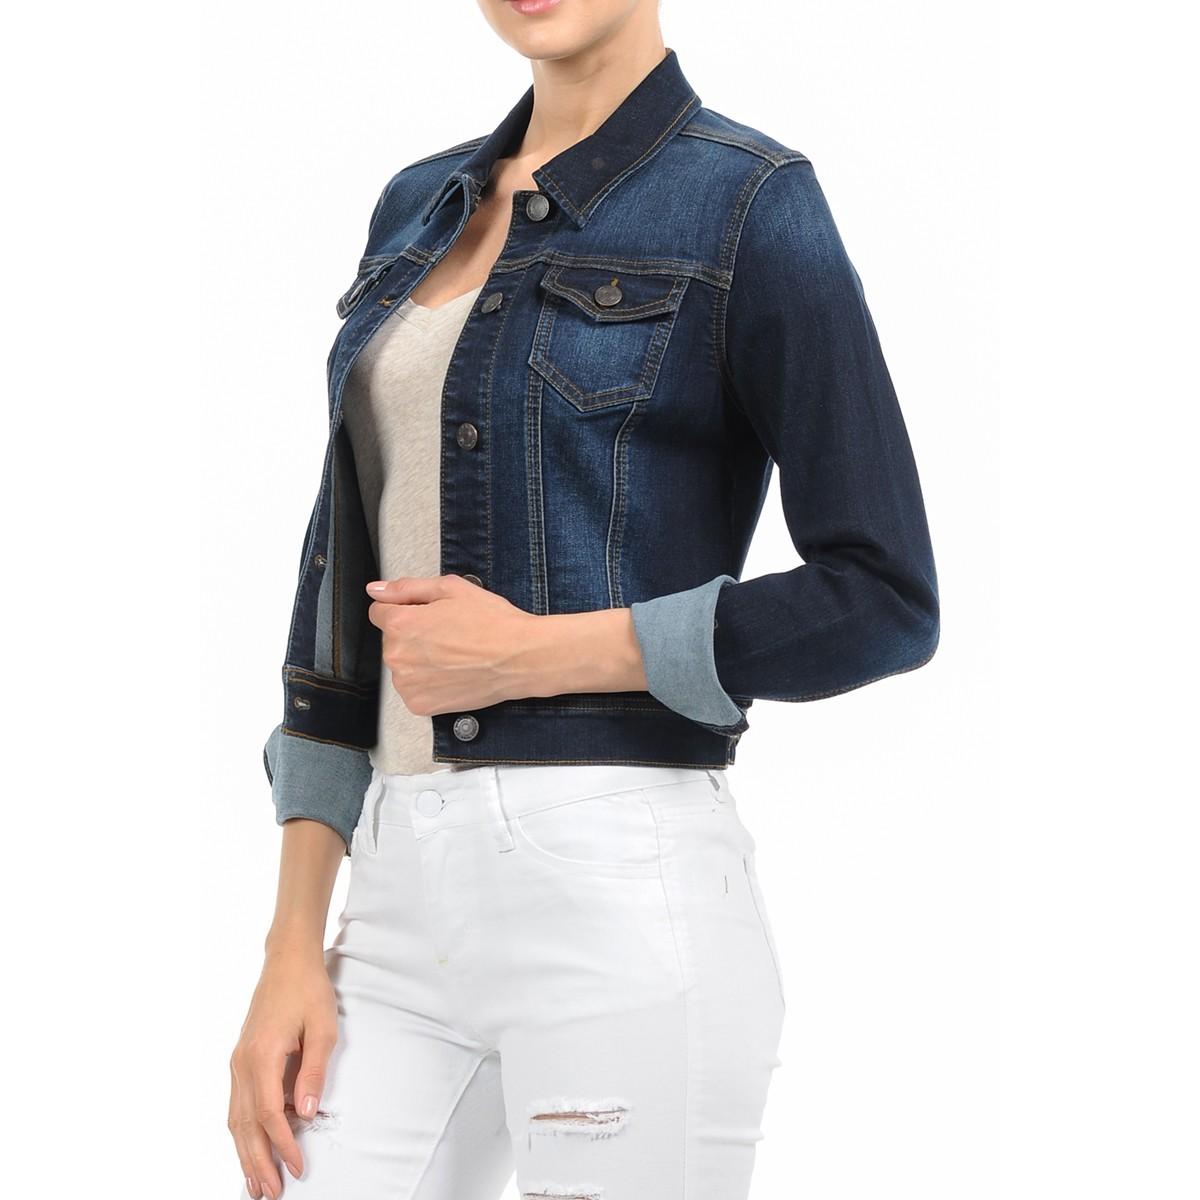 Women-039-s-Plus-Size-Cropped-Denim-Jackets-Long-Sleeve-Jean-Coats thumbnail 5